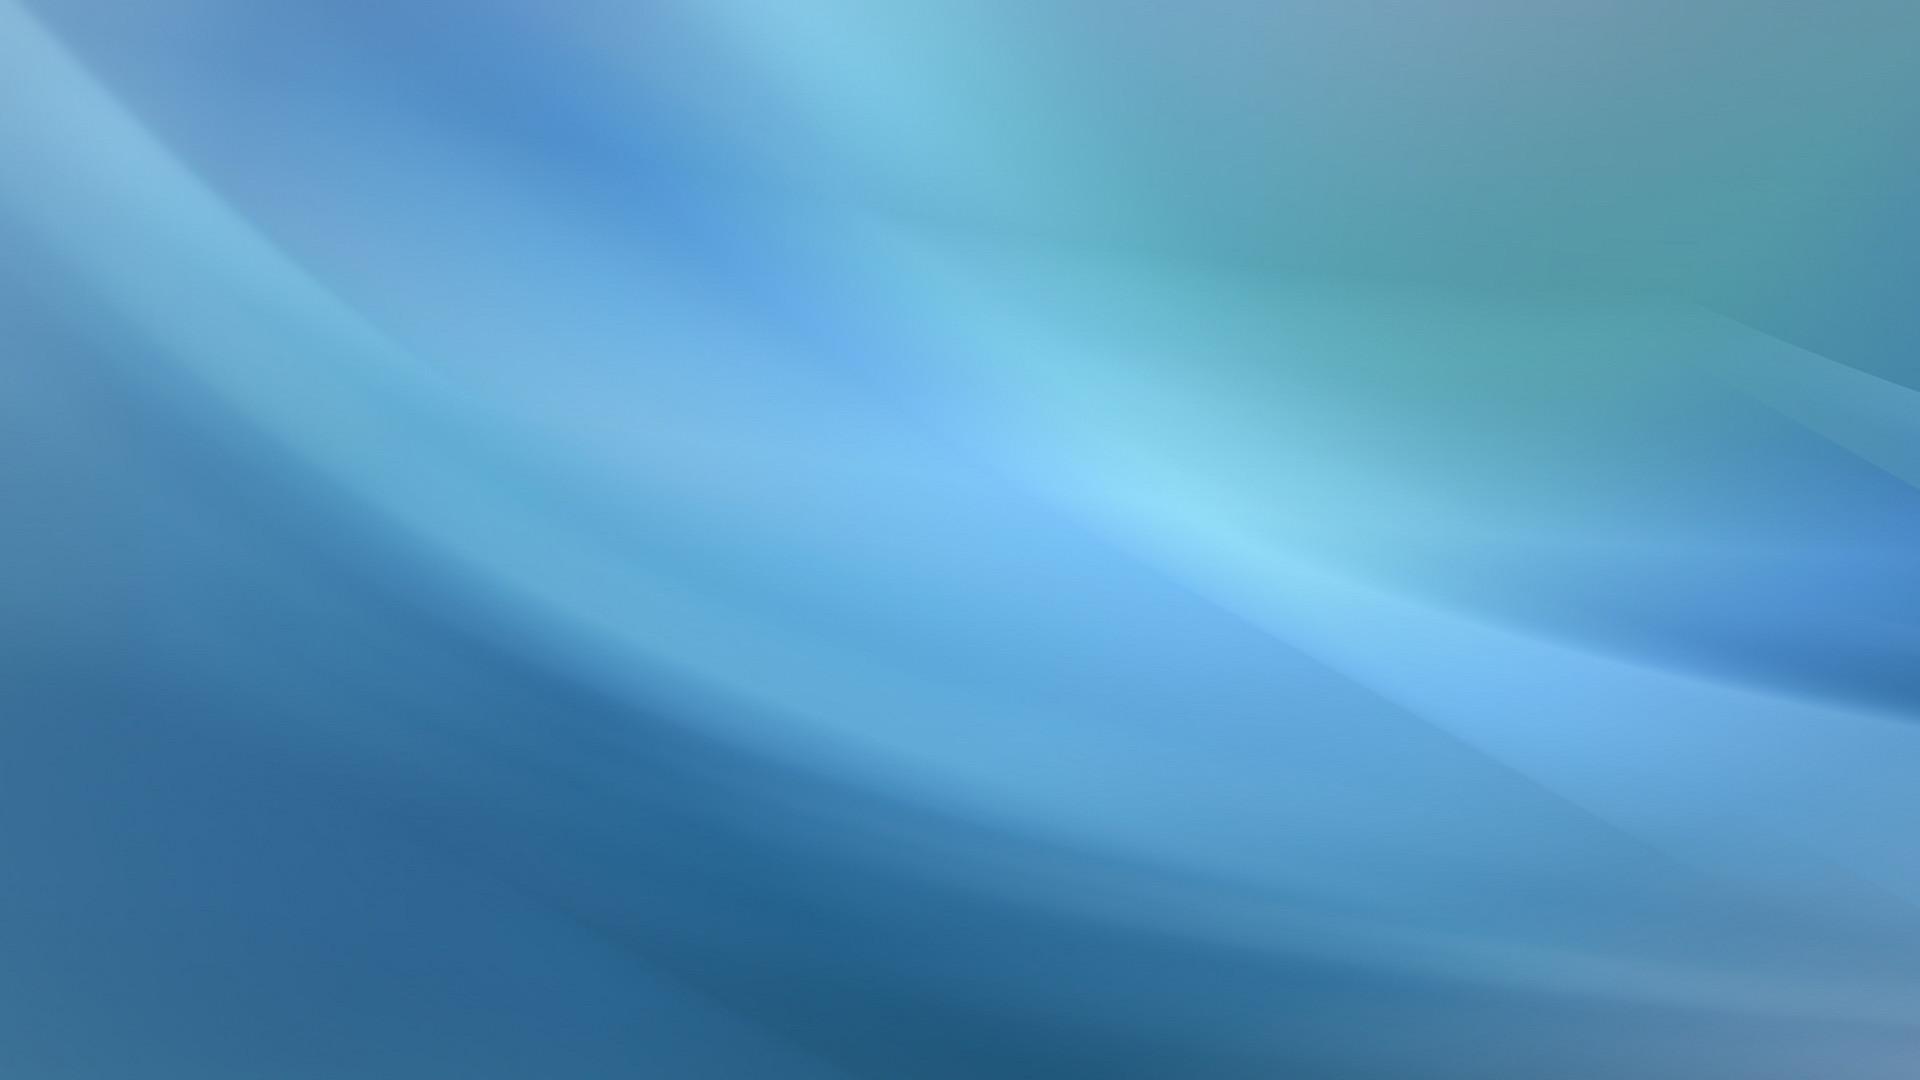 The Color Light Blue